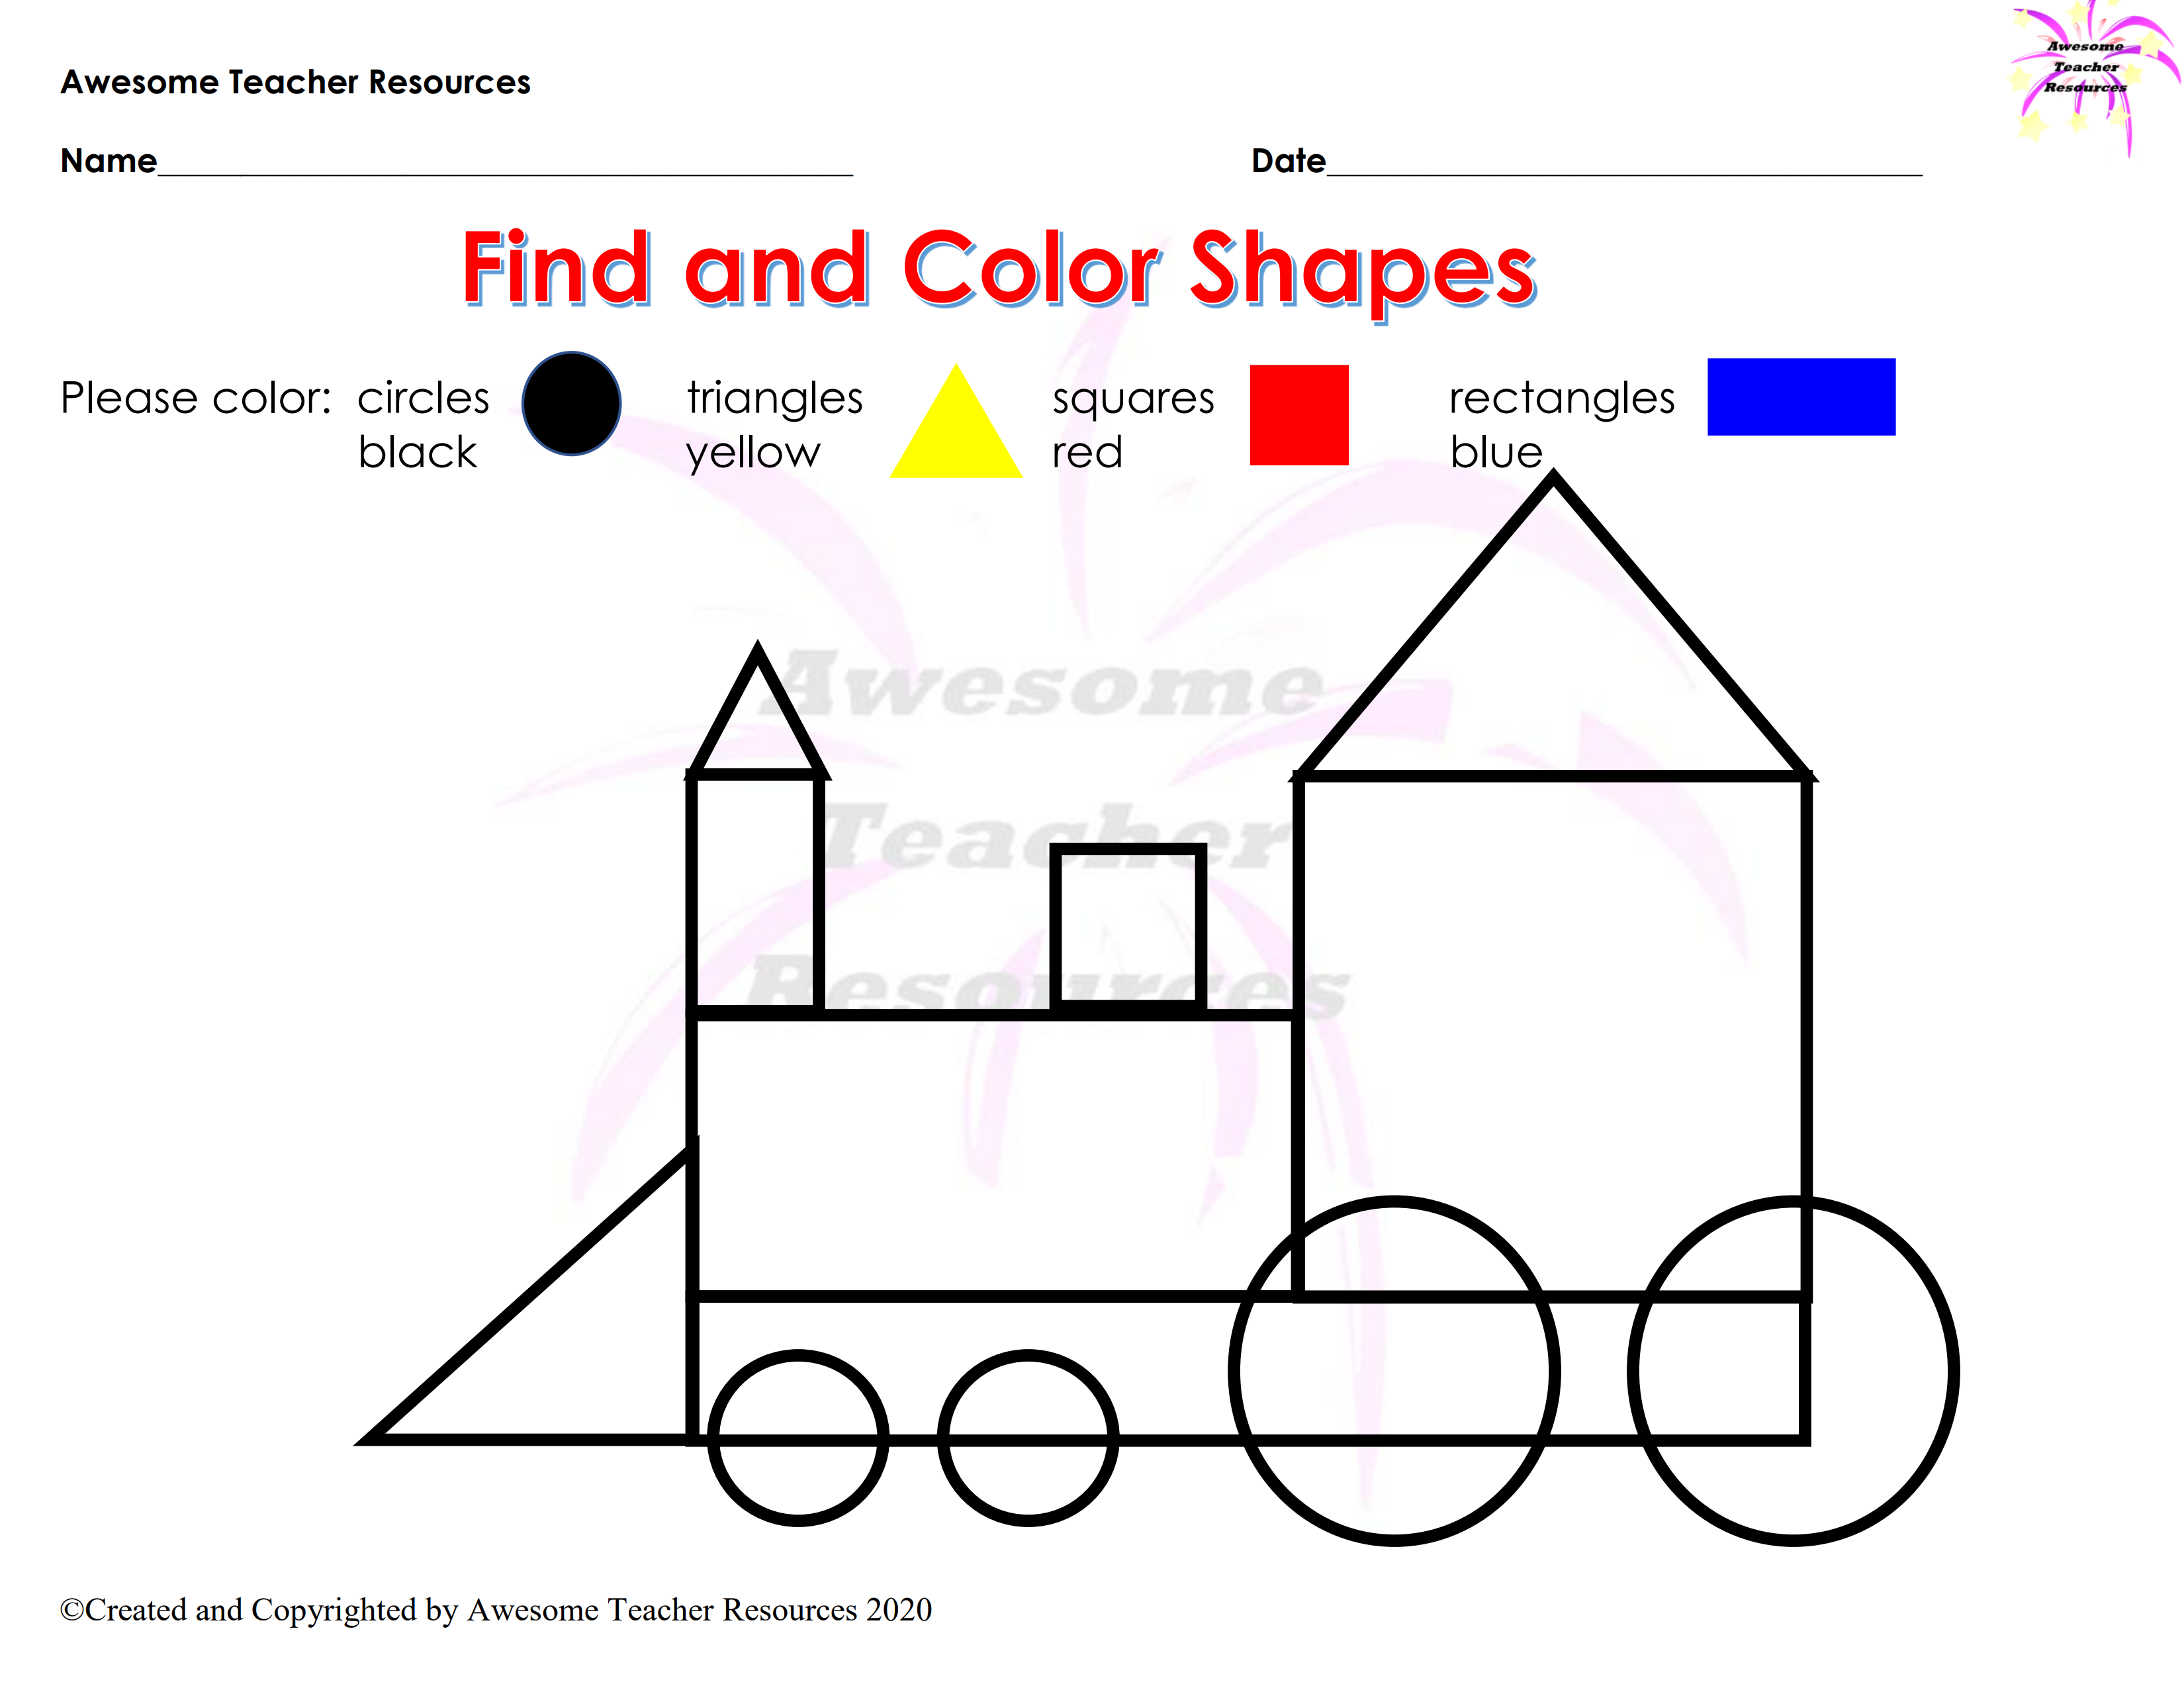 Geometric Shapes Coloring Pages Shape Worksheets For Preschool Shapes For Kids Shape Coloring Pages [ 1754 x 1239 Pixel ]